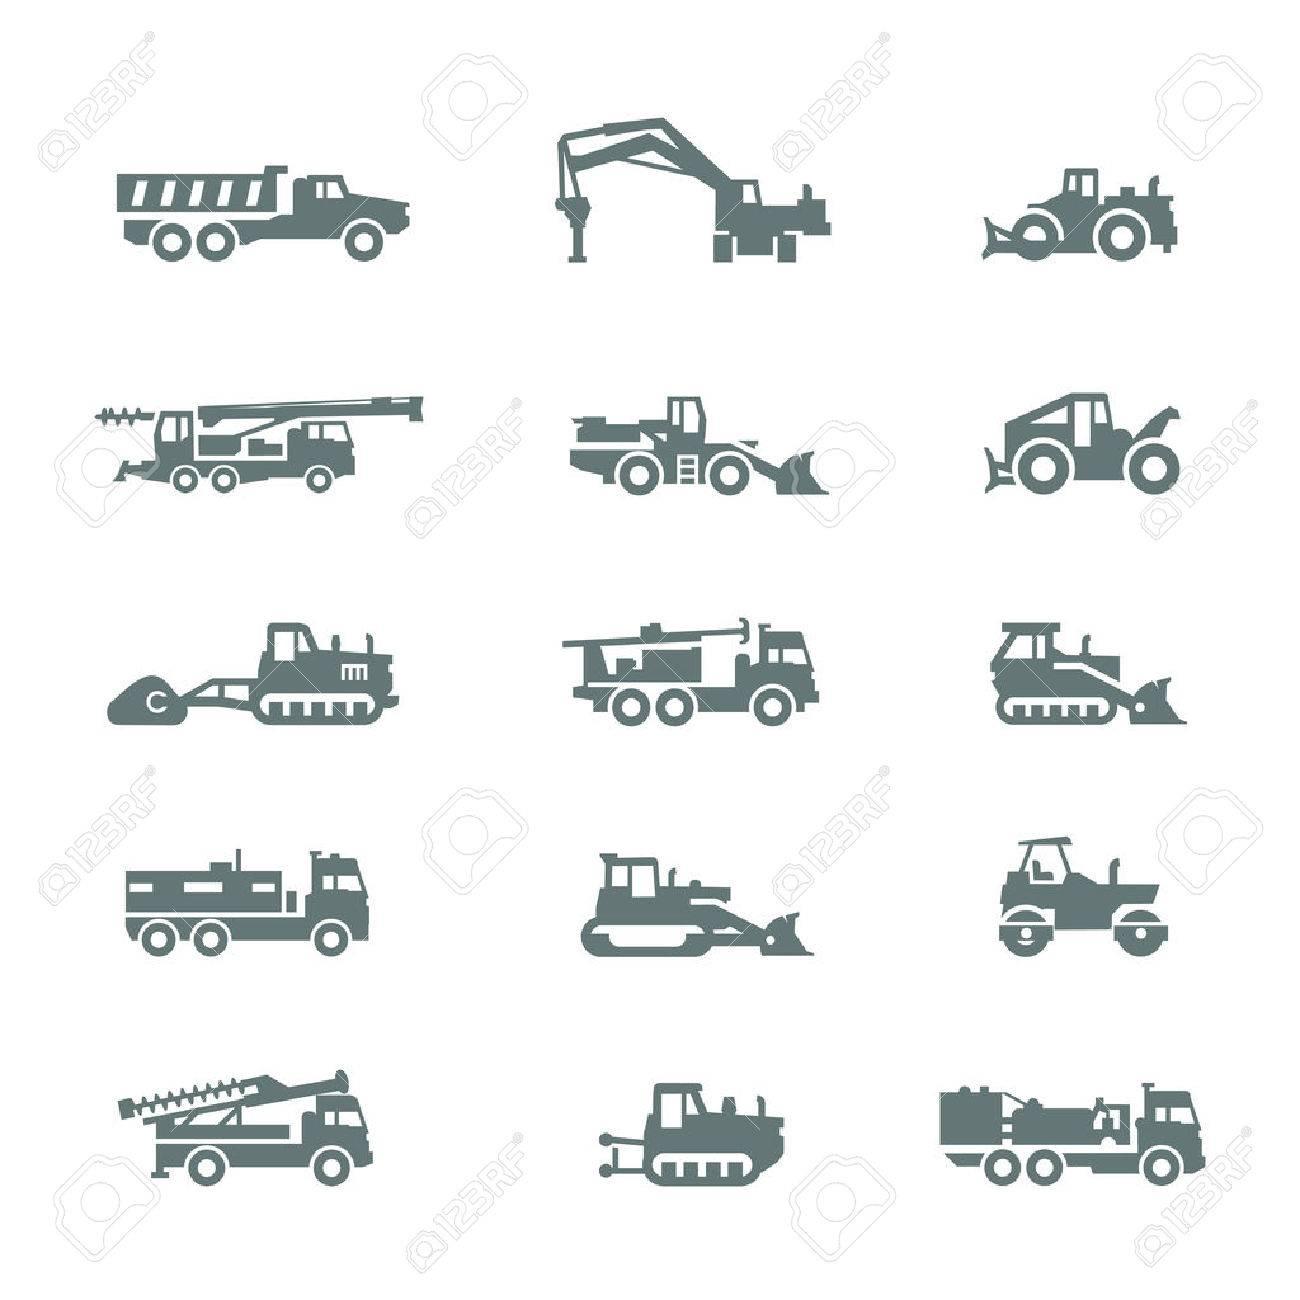 Сonstruction machinery Stock Vector - 23833197